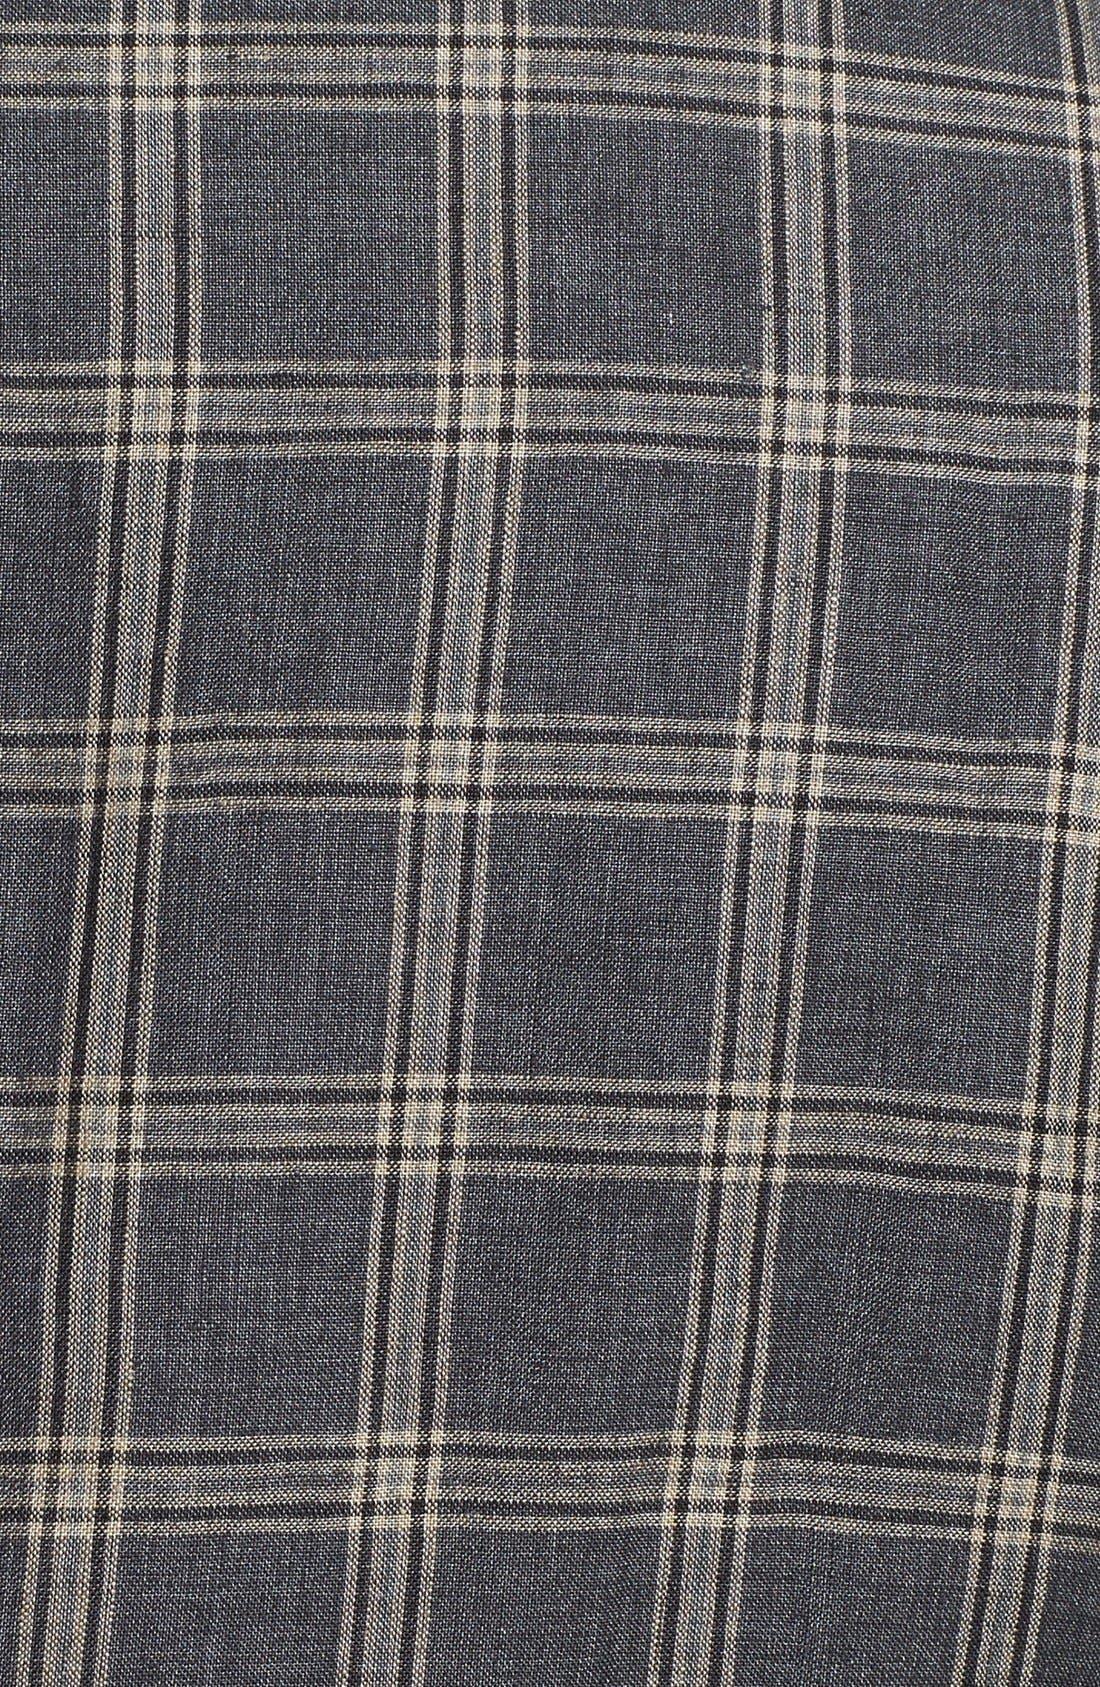 Alternate Image 3  - Nordstrom Classic Fit Linen Sportcoat